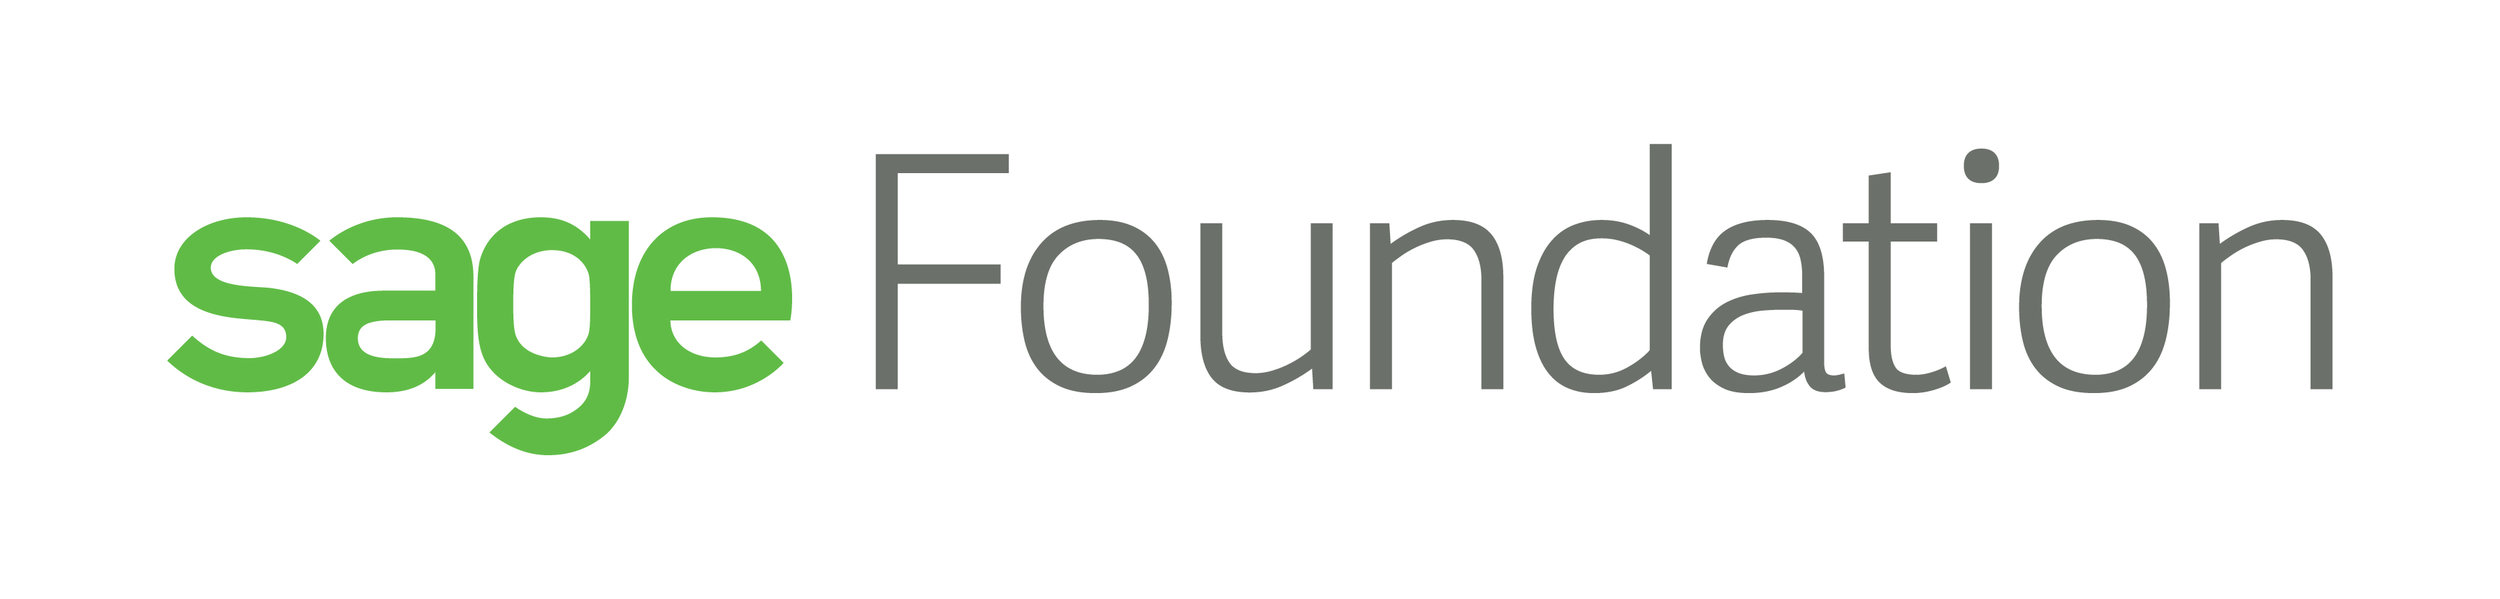 Sage_Foundation_logo.jpg